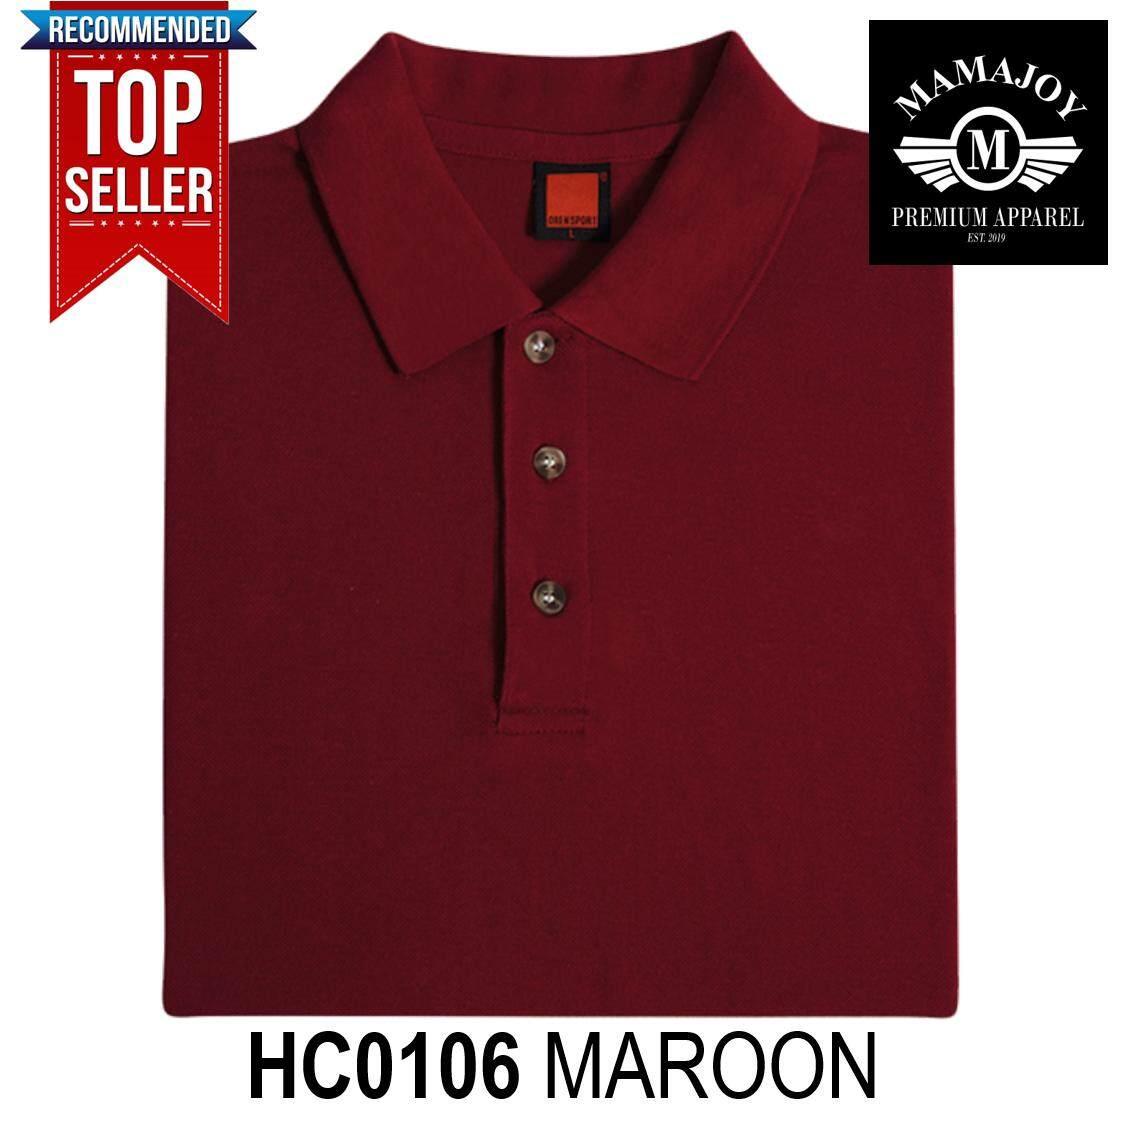 fac5f23b BEST OFFER! SALES! NEW! OREN SPORT HC01 Unisex Collar Short Sleeve Summer  Fashion Plain Honeycomb Polo Tshirt 230gsm (Colour : MAROON) HC0106